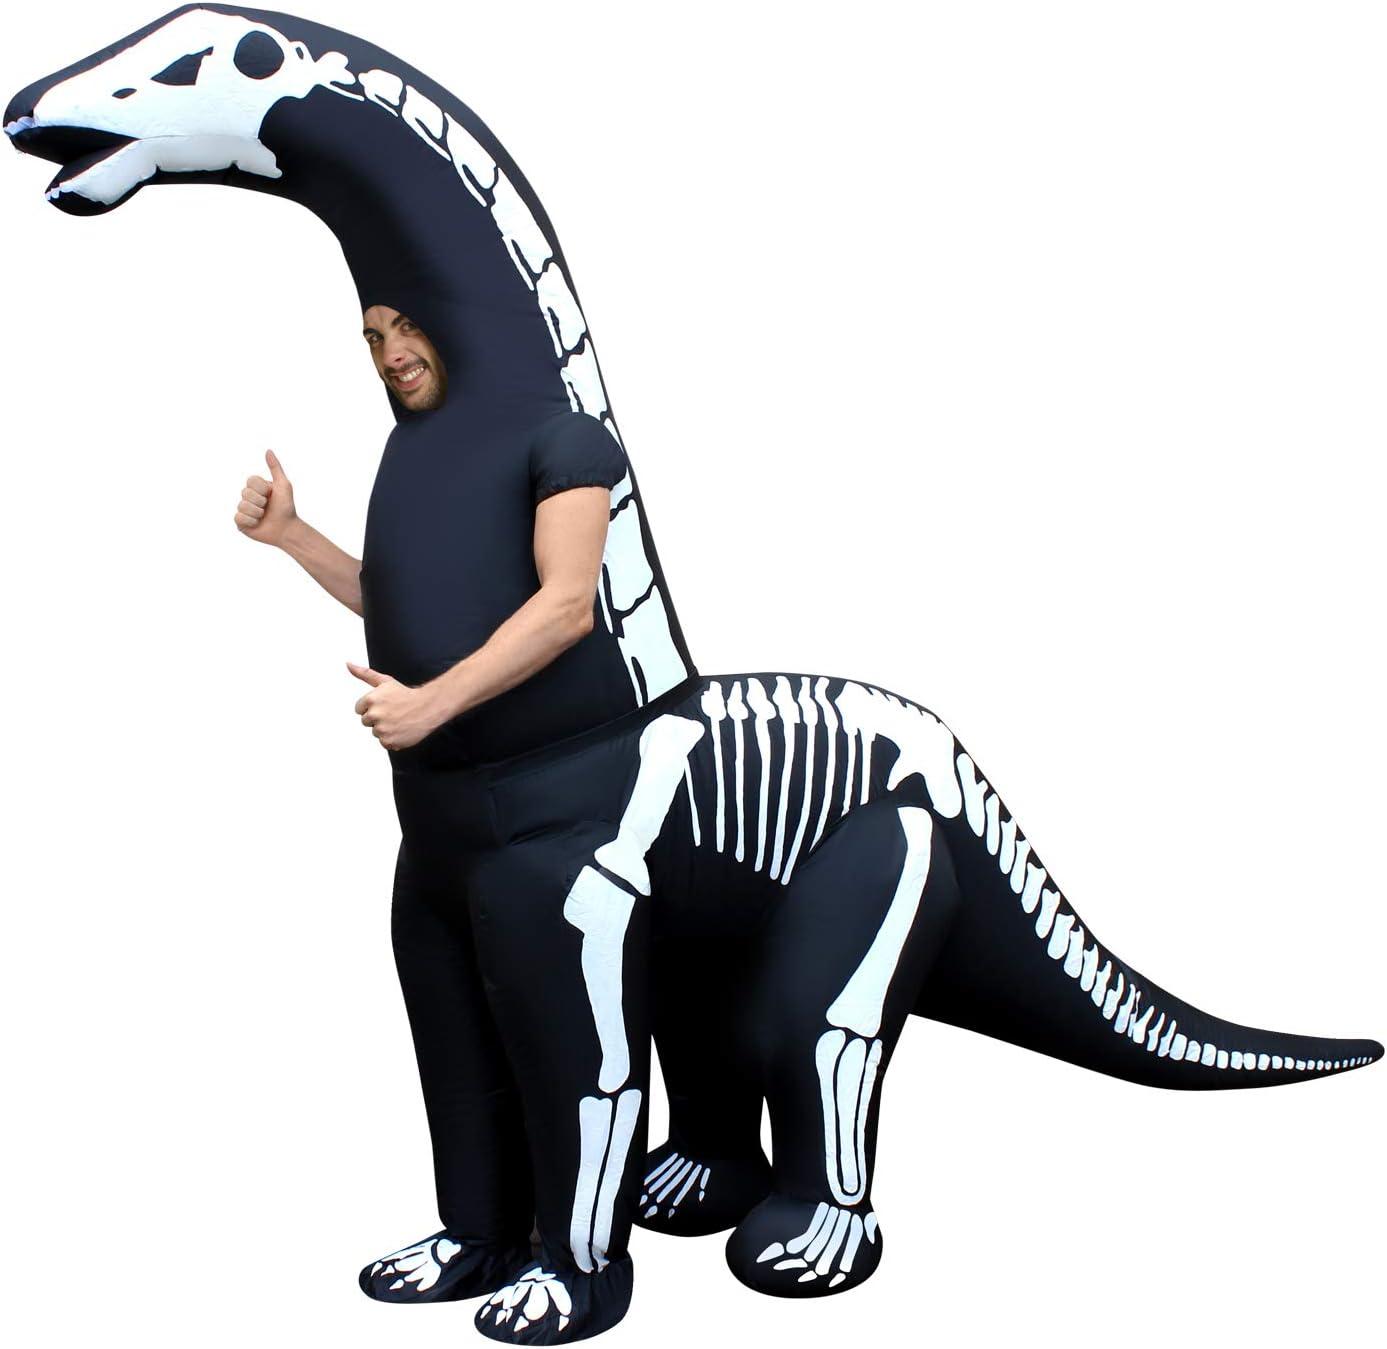 Morph Skeleton Diplodocus Inflatable Dinosaur Costume Adult Jurassic Giant - One Size